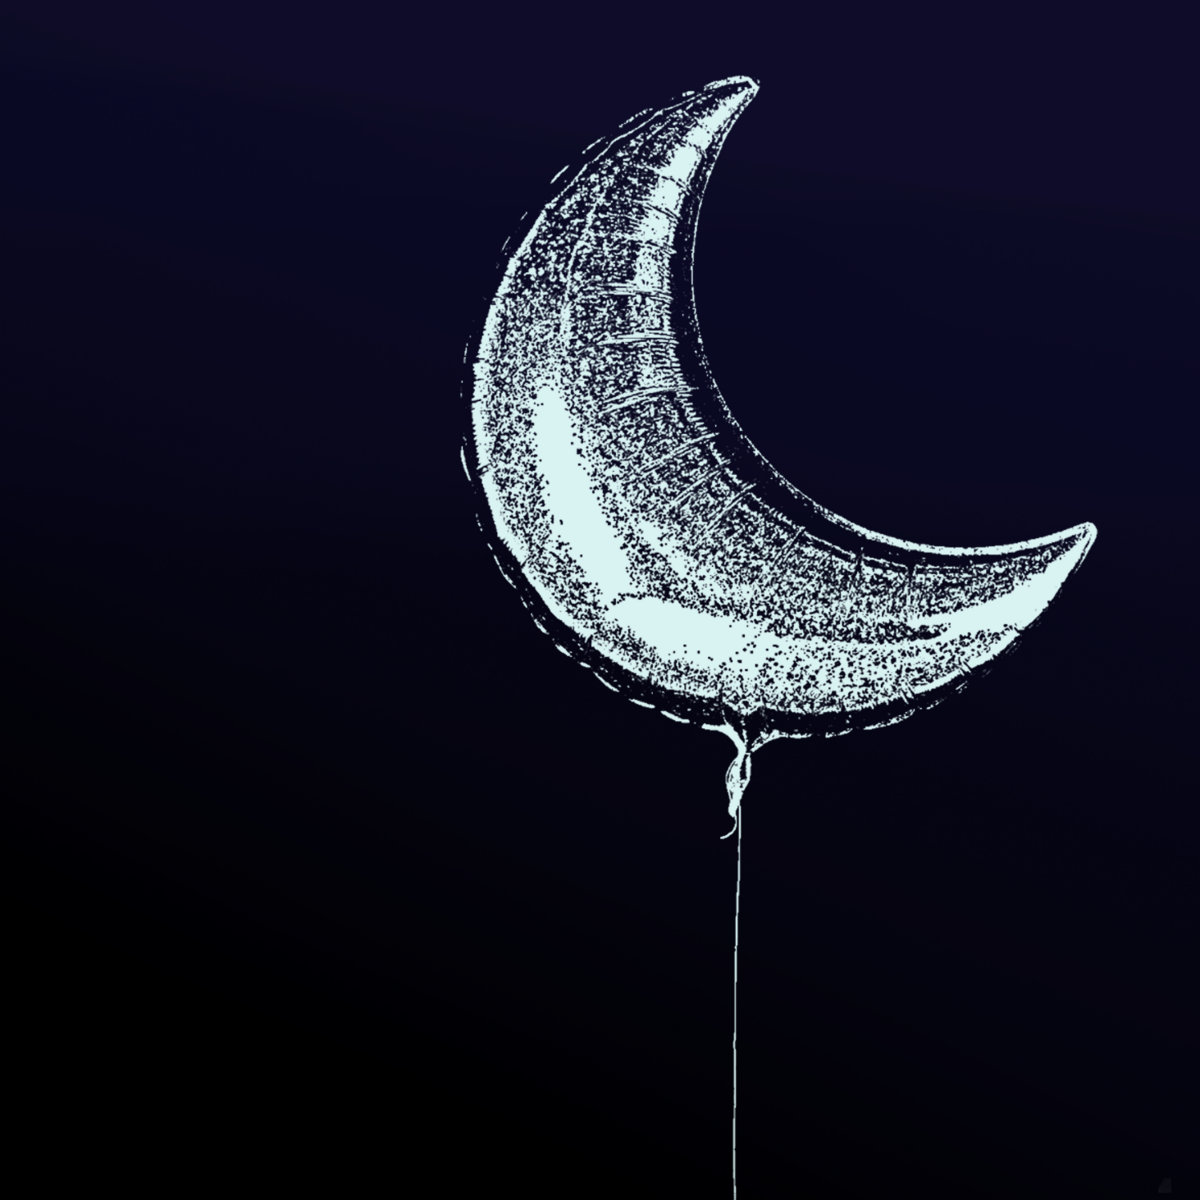 moon balloon expendable friend